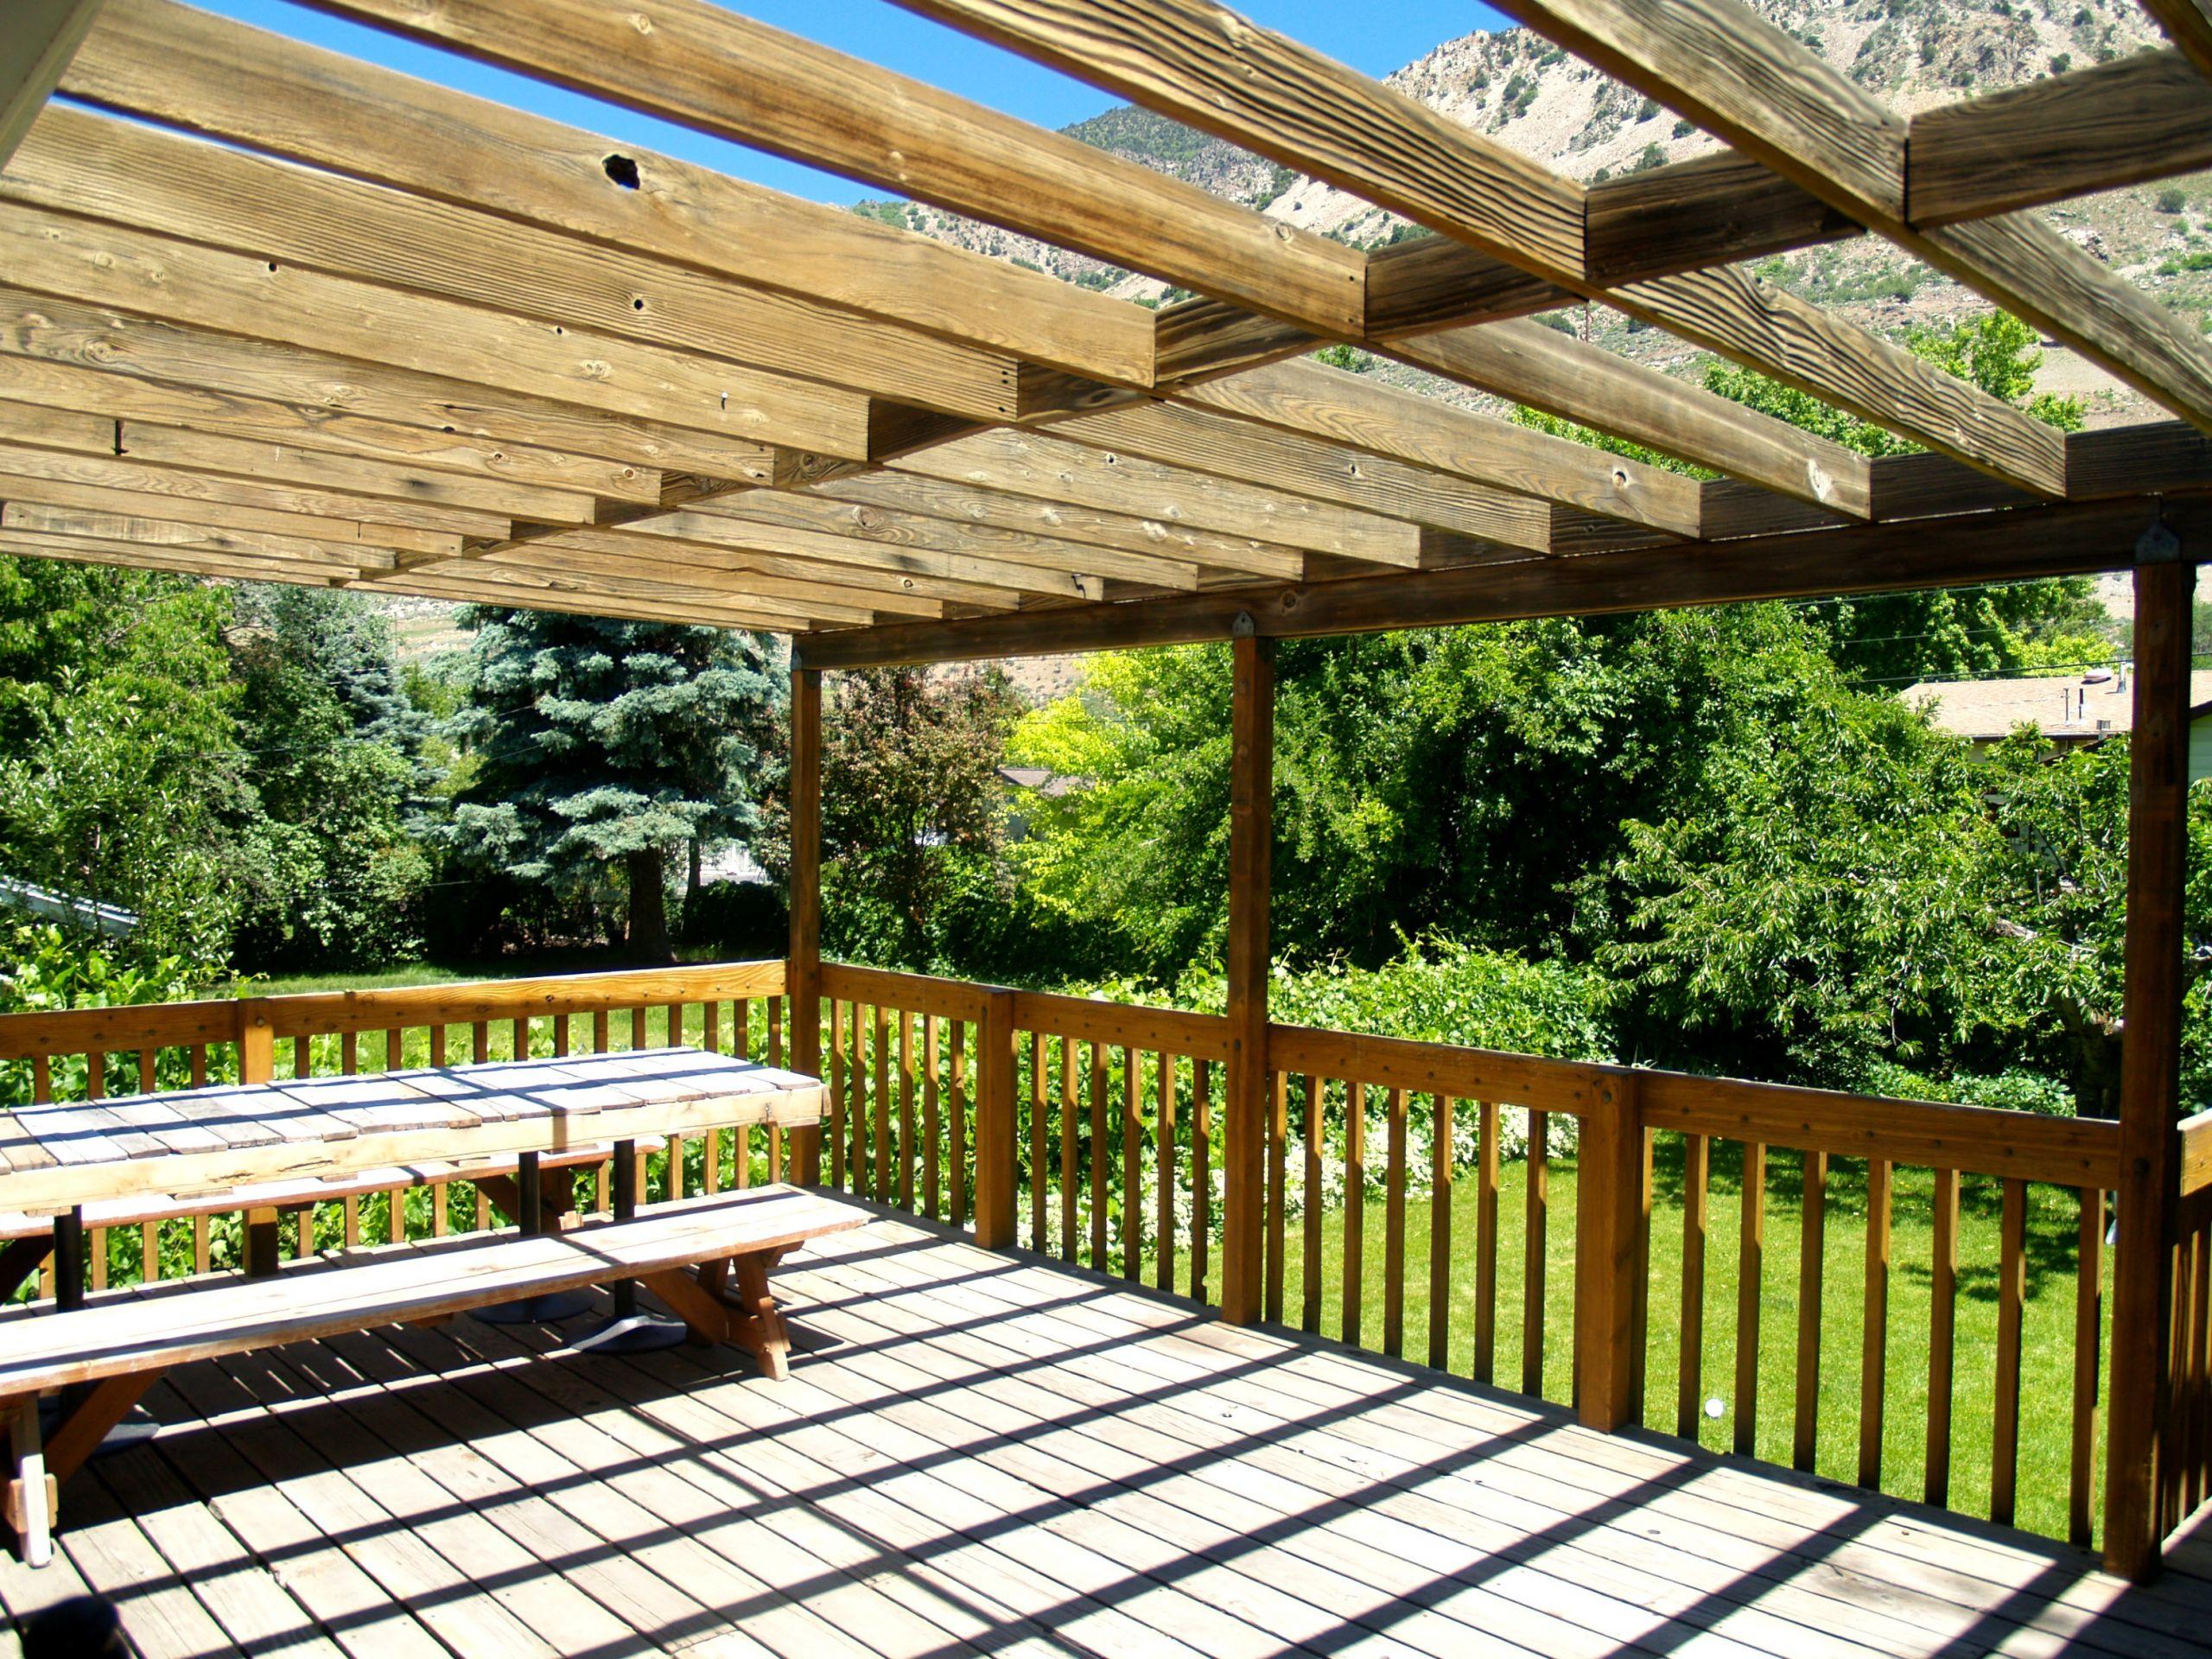 DIY Outdoor Shade  Outdoor Space Makeover Painted Floors & DIY Drop Cloth Shade